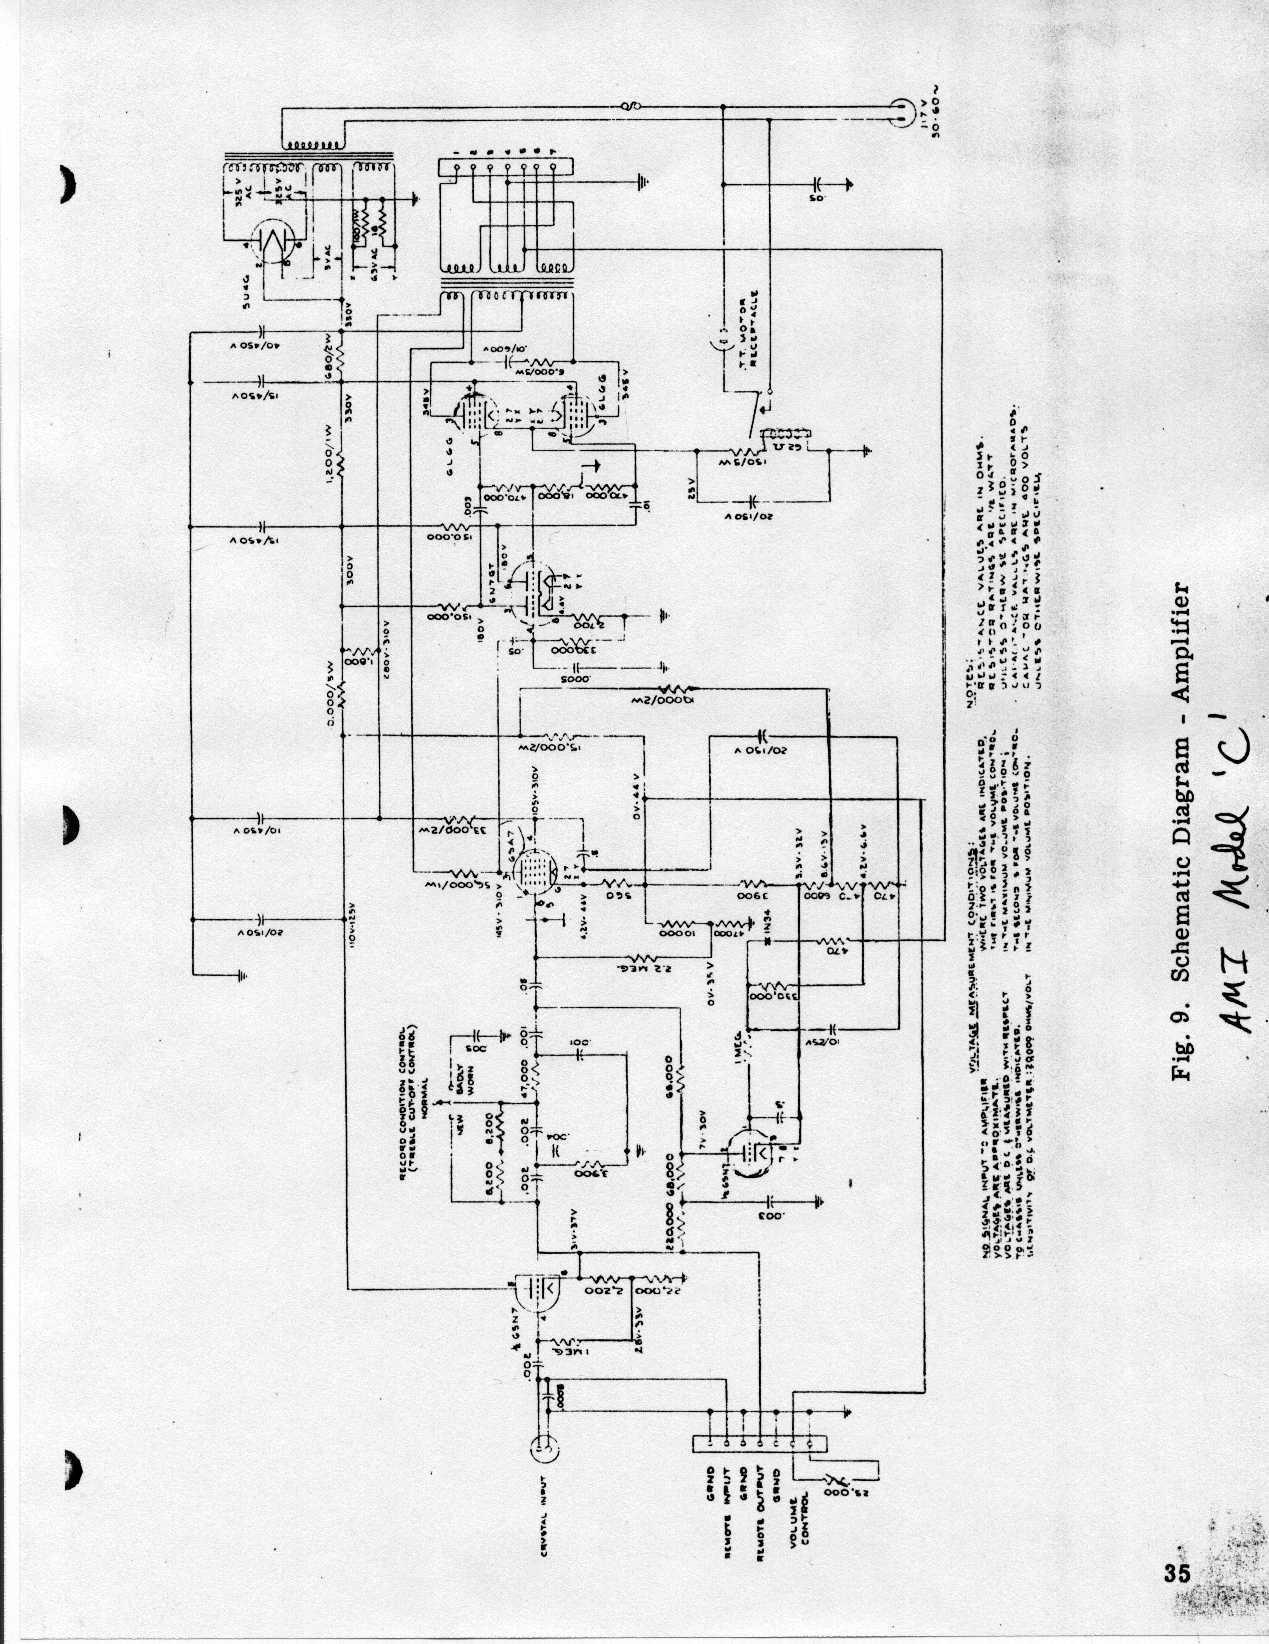 ami model cc tech question